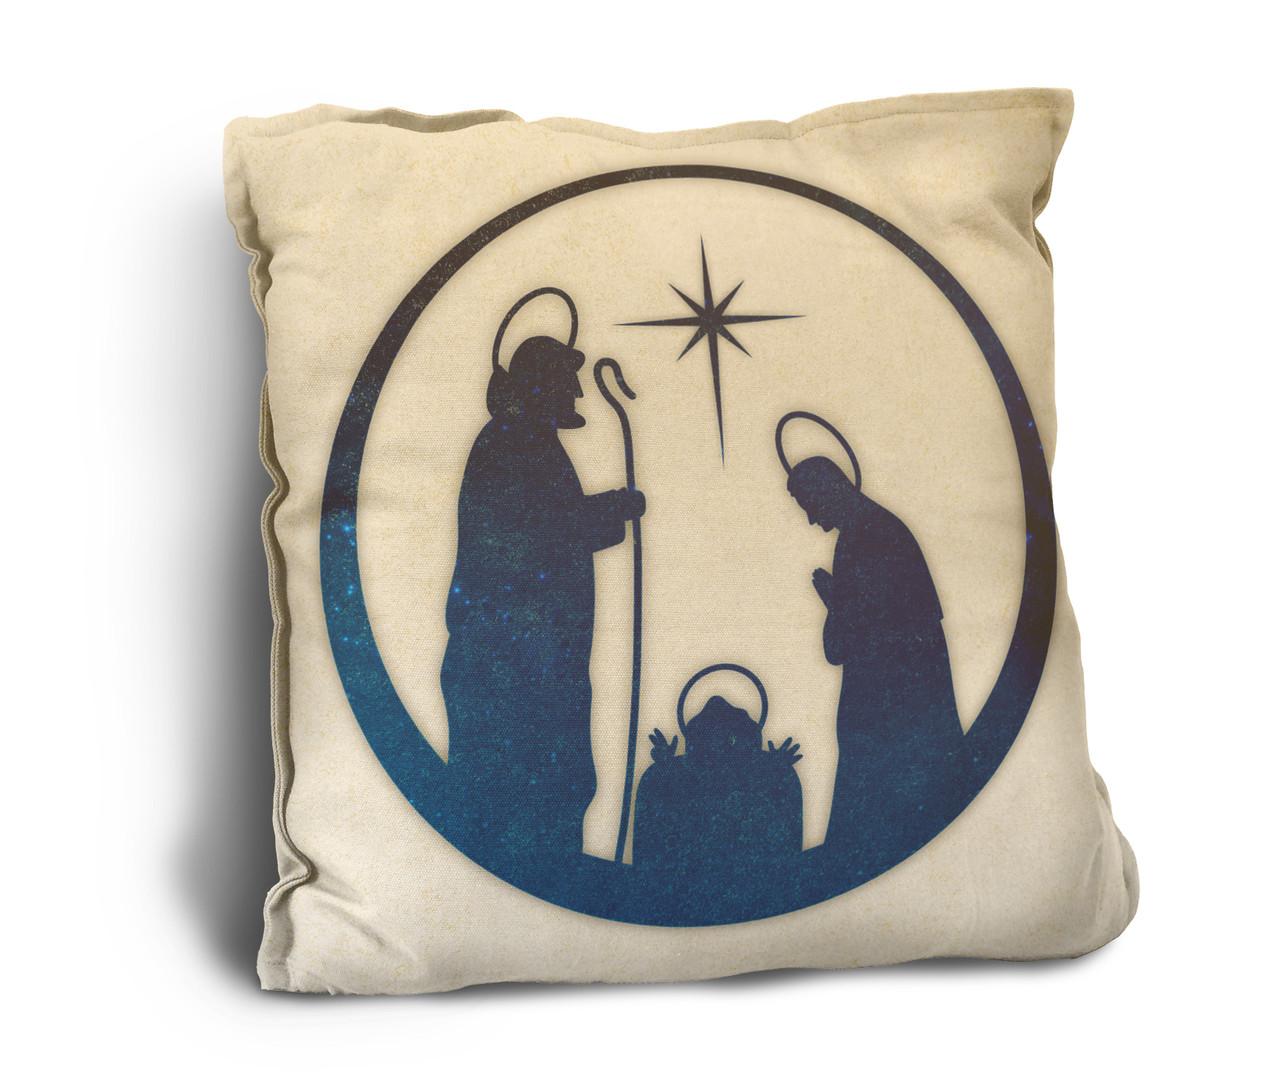 Vintage Nativity Rustic Pillow